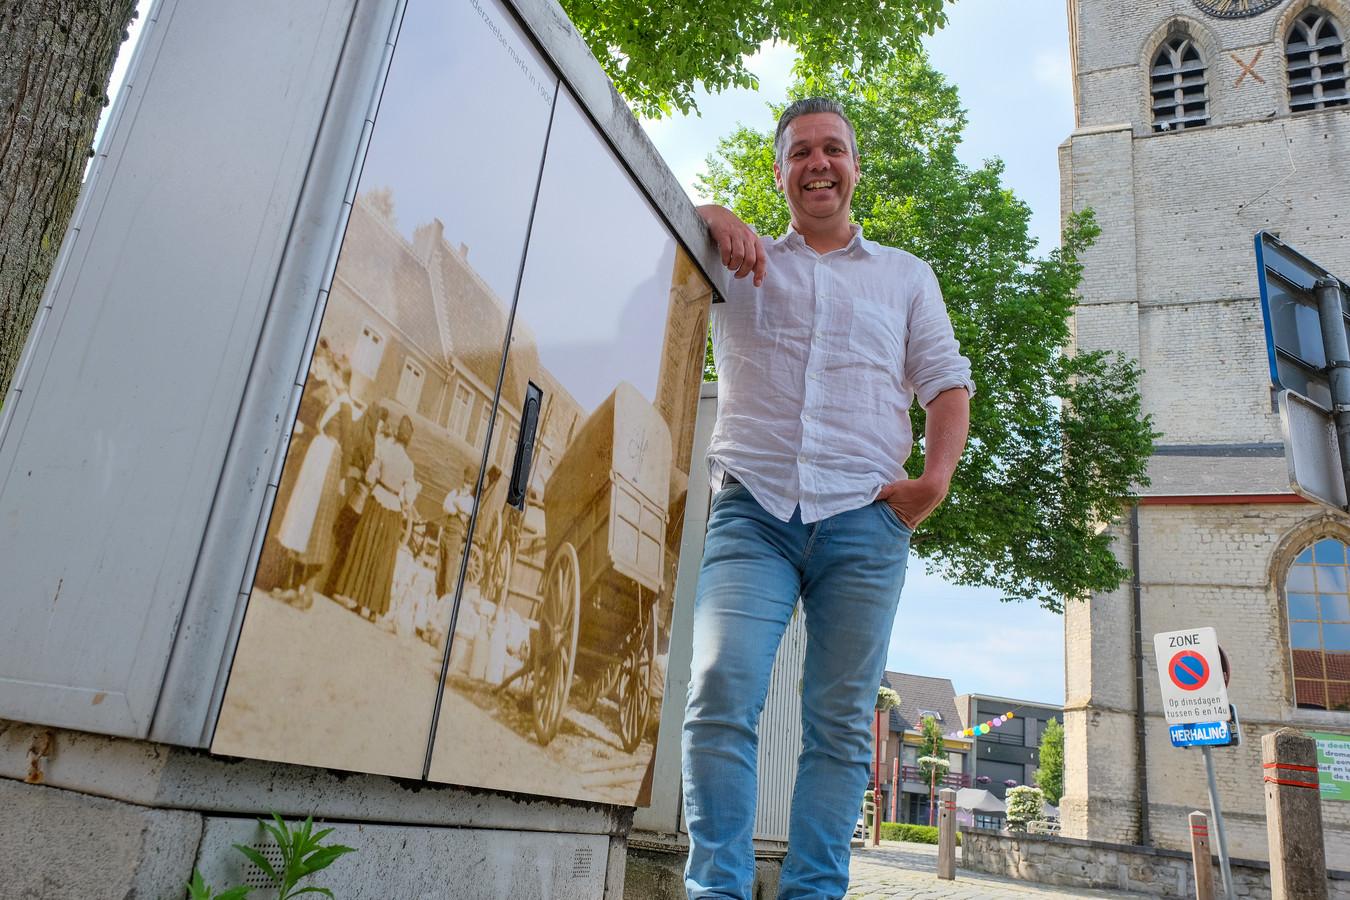 oude foto's sieren elektriciteitskasten in Londerzeel: Dimi Robbyns